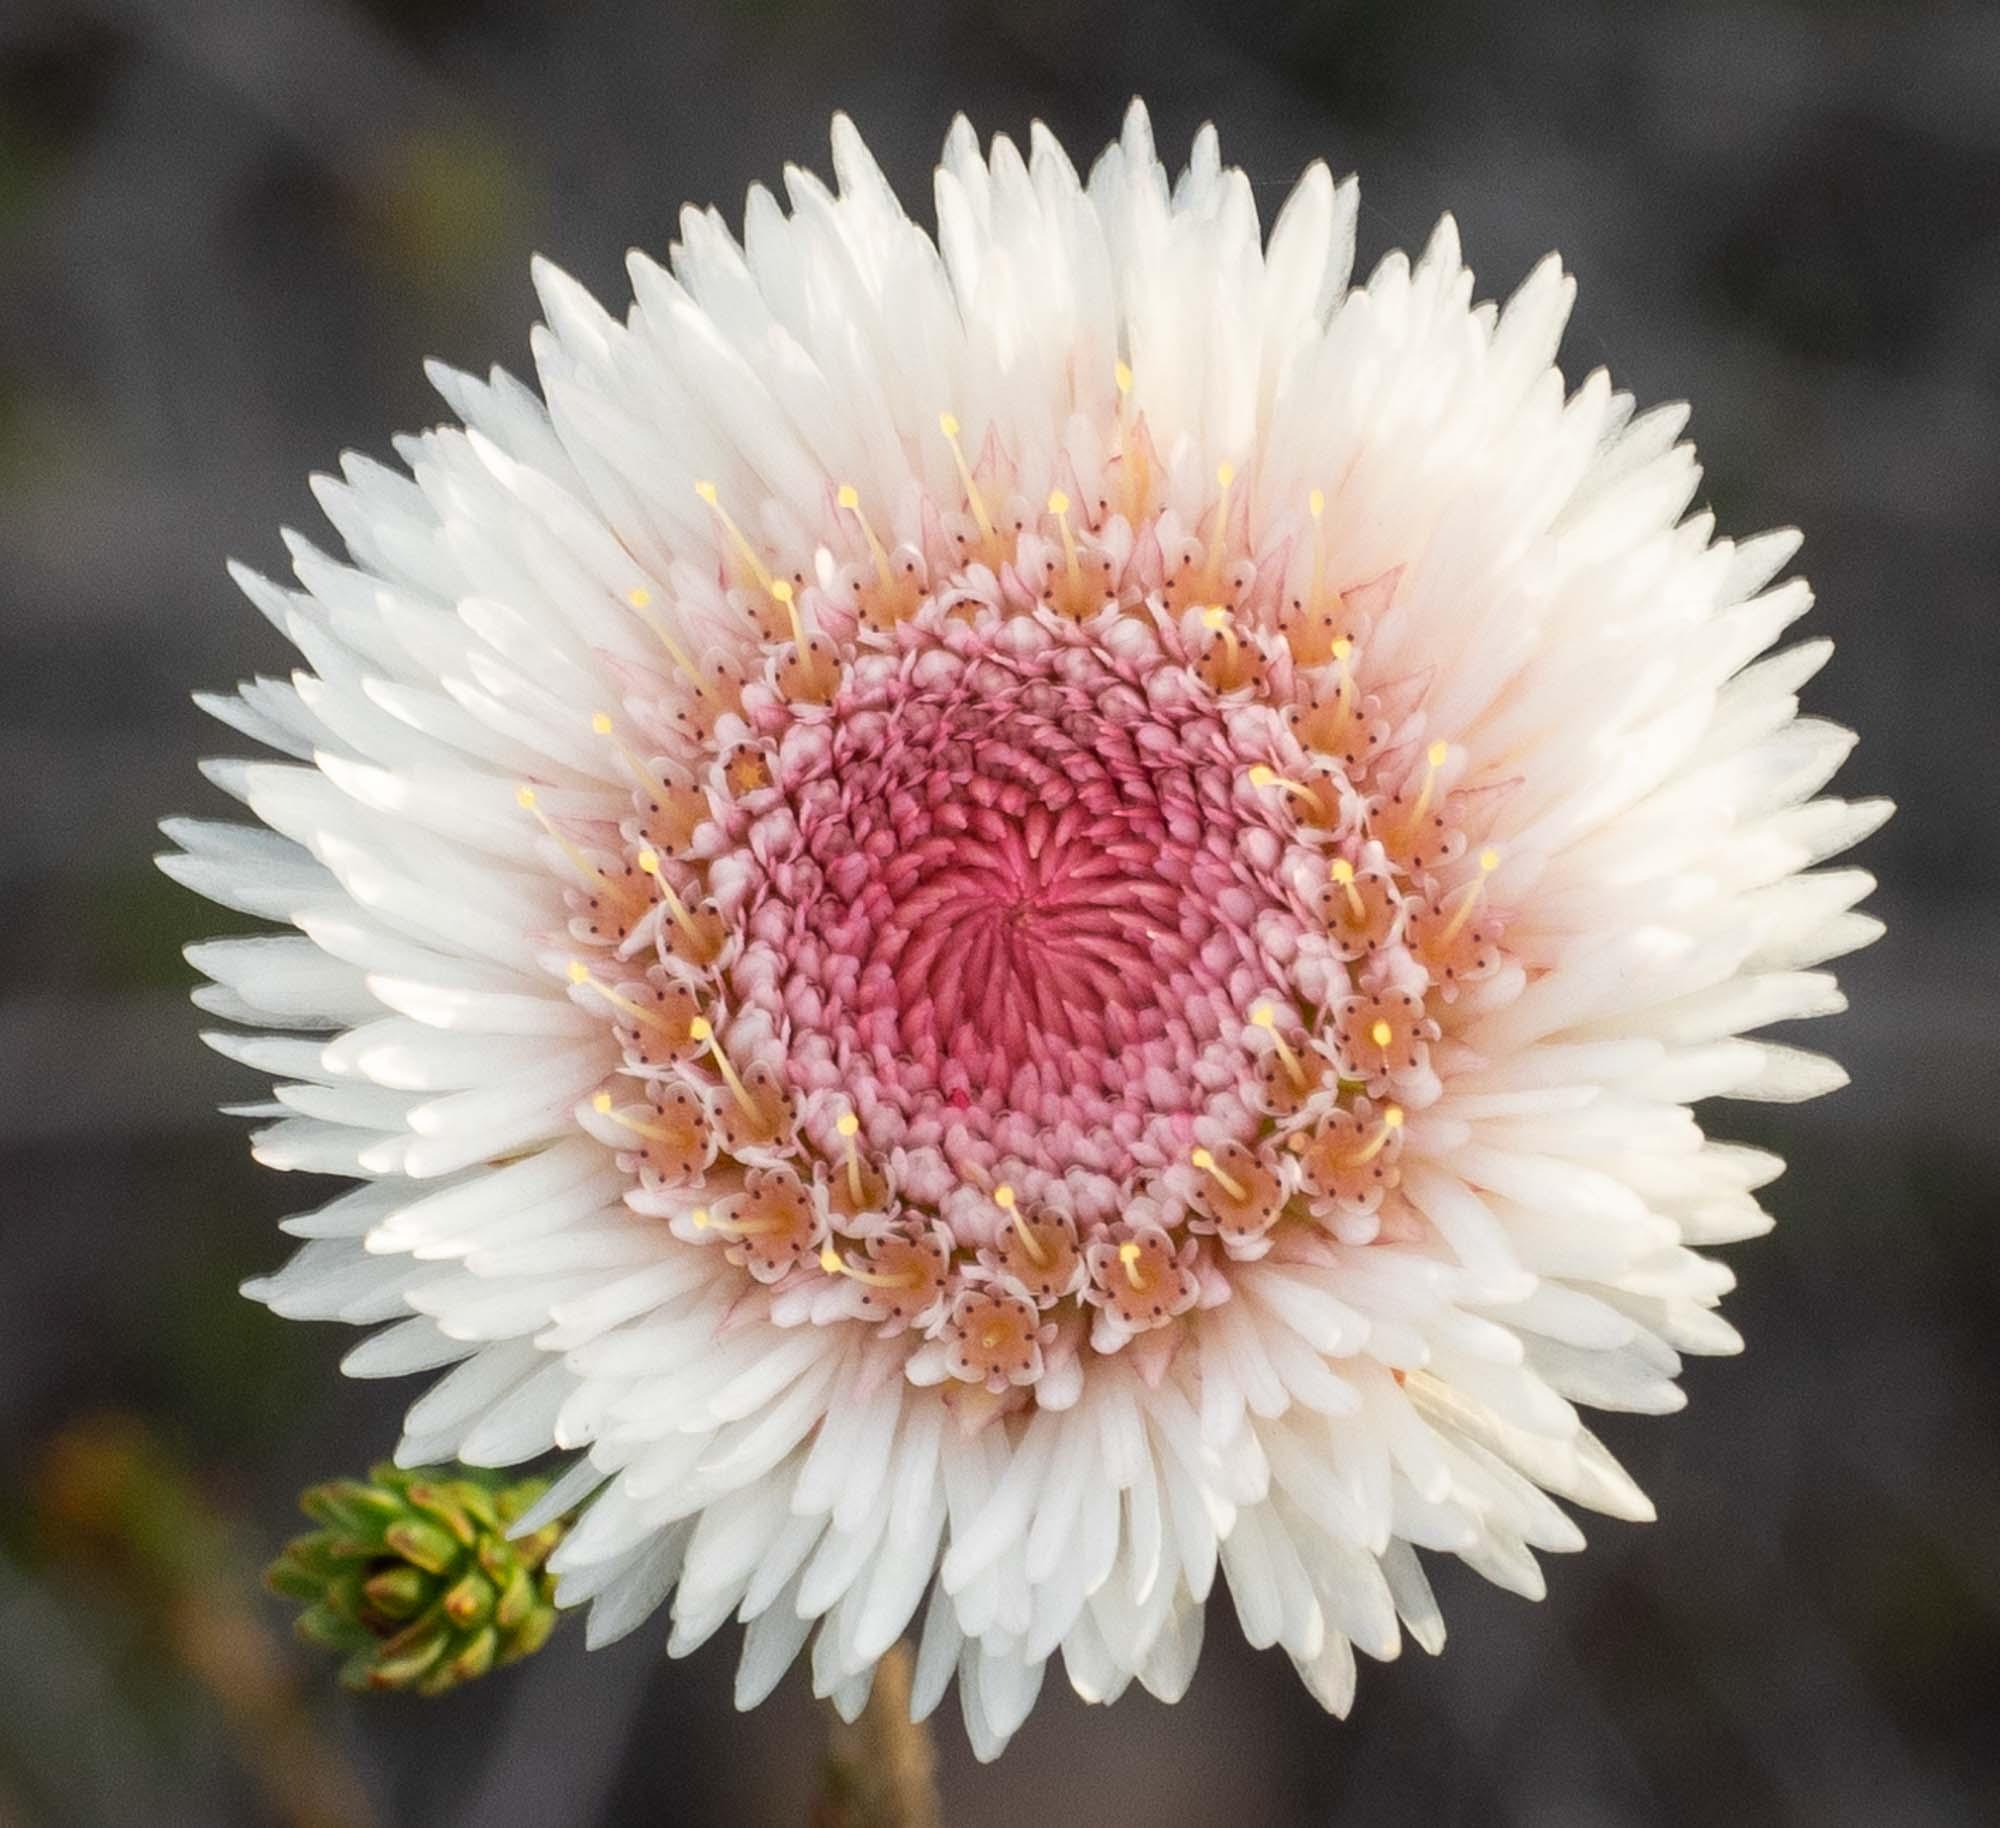 Actinodium cunninghamii (Swamp Daisy)